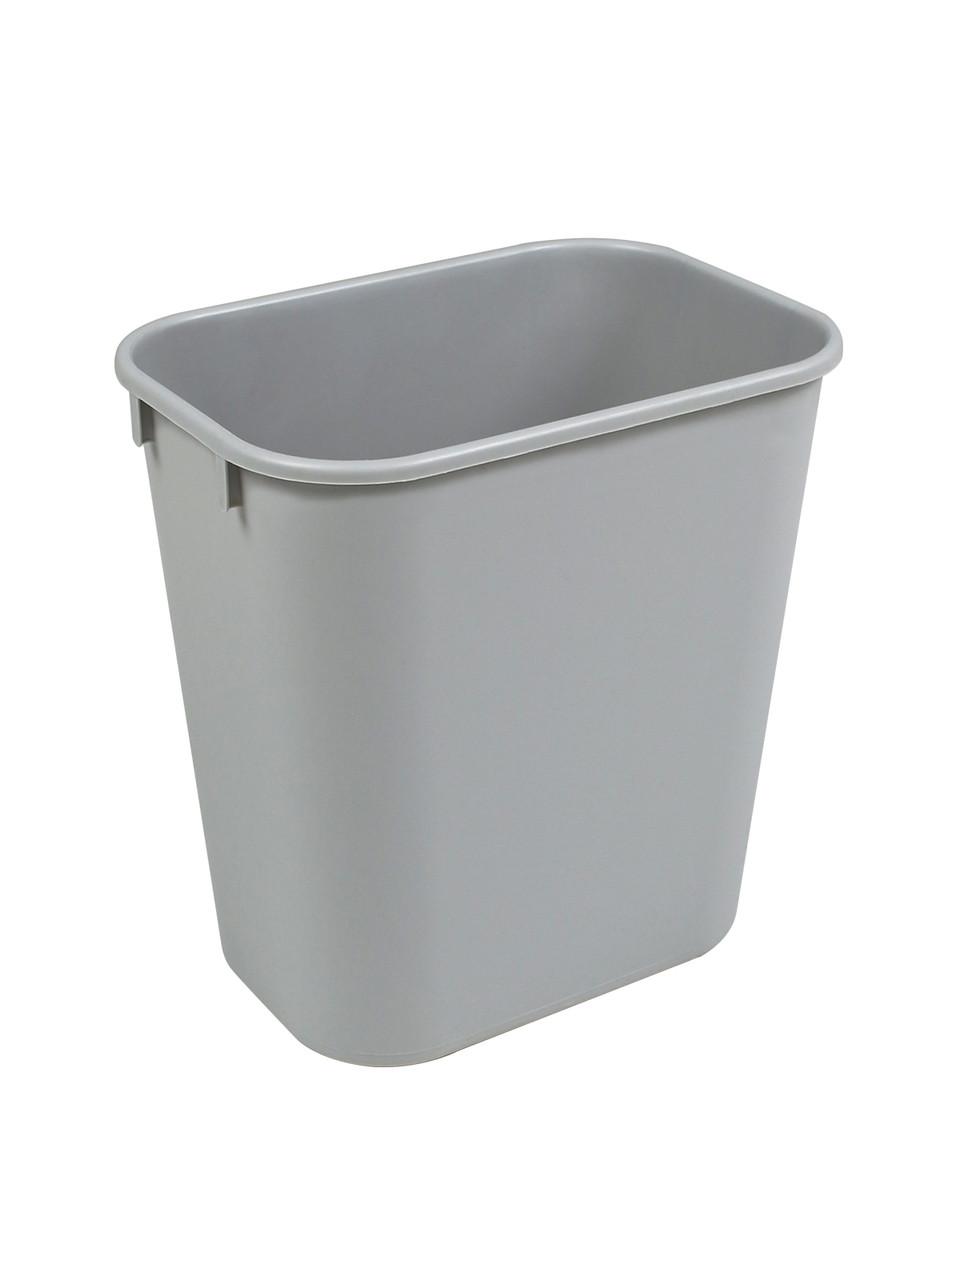 14 Quart Plastic Office Desk Side Wastebaskets Gray 14Q-GY (30 Pack)